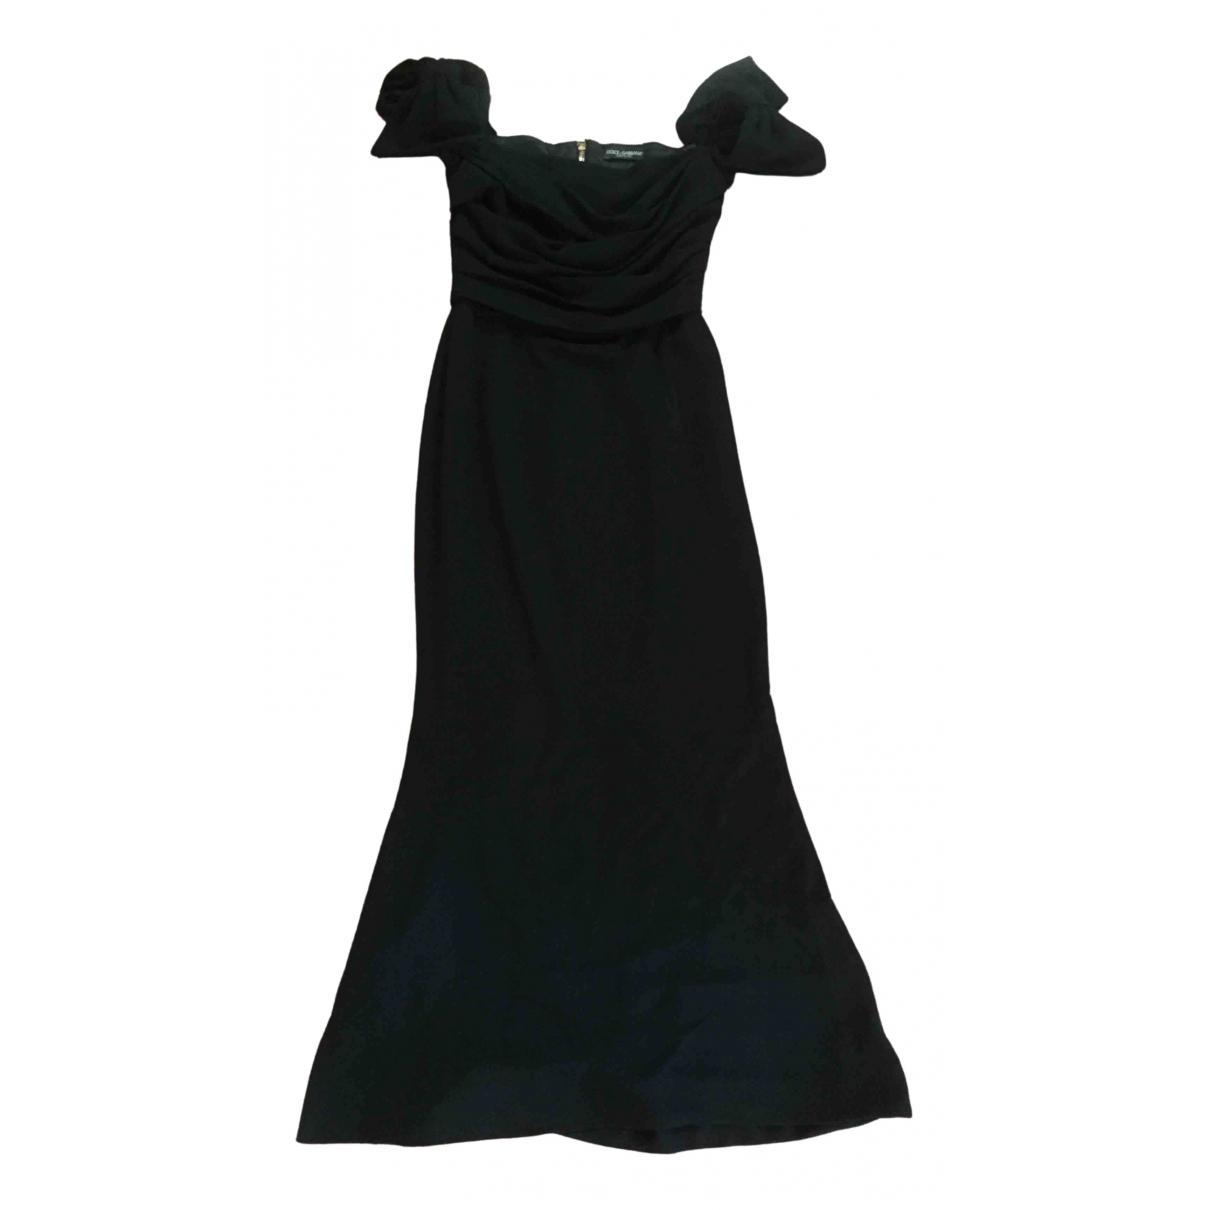 Dolce & Gabbana \N Black Silk dress for Women 44 IT